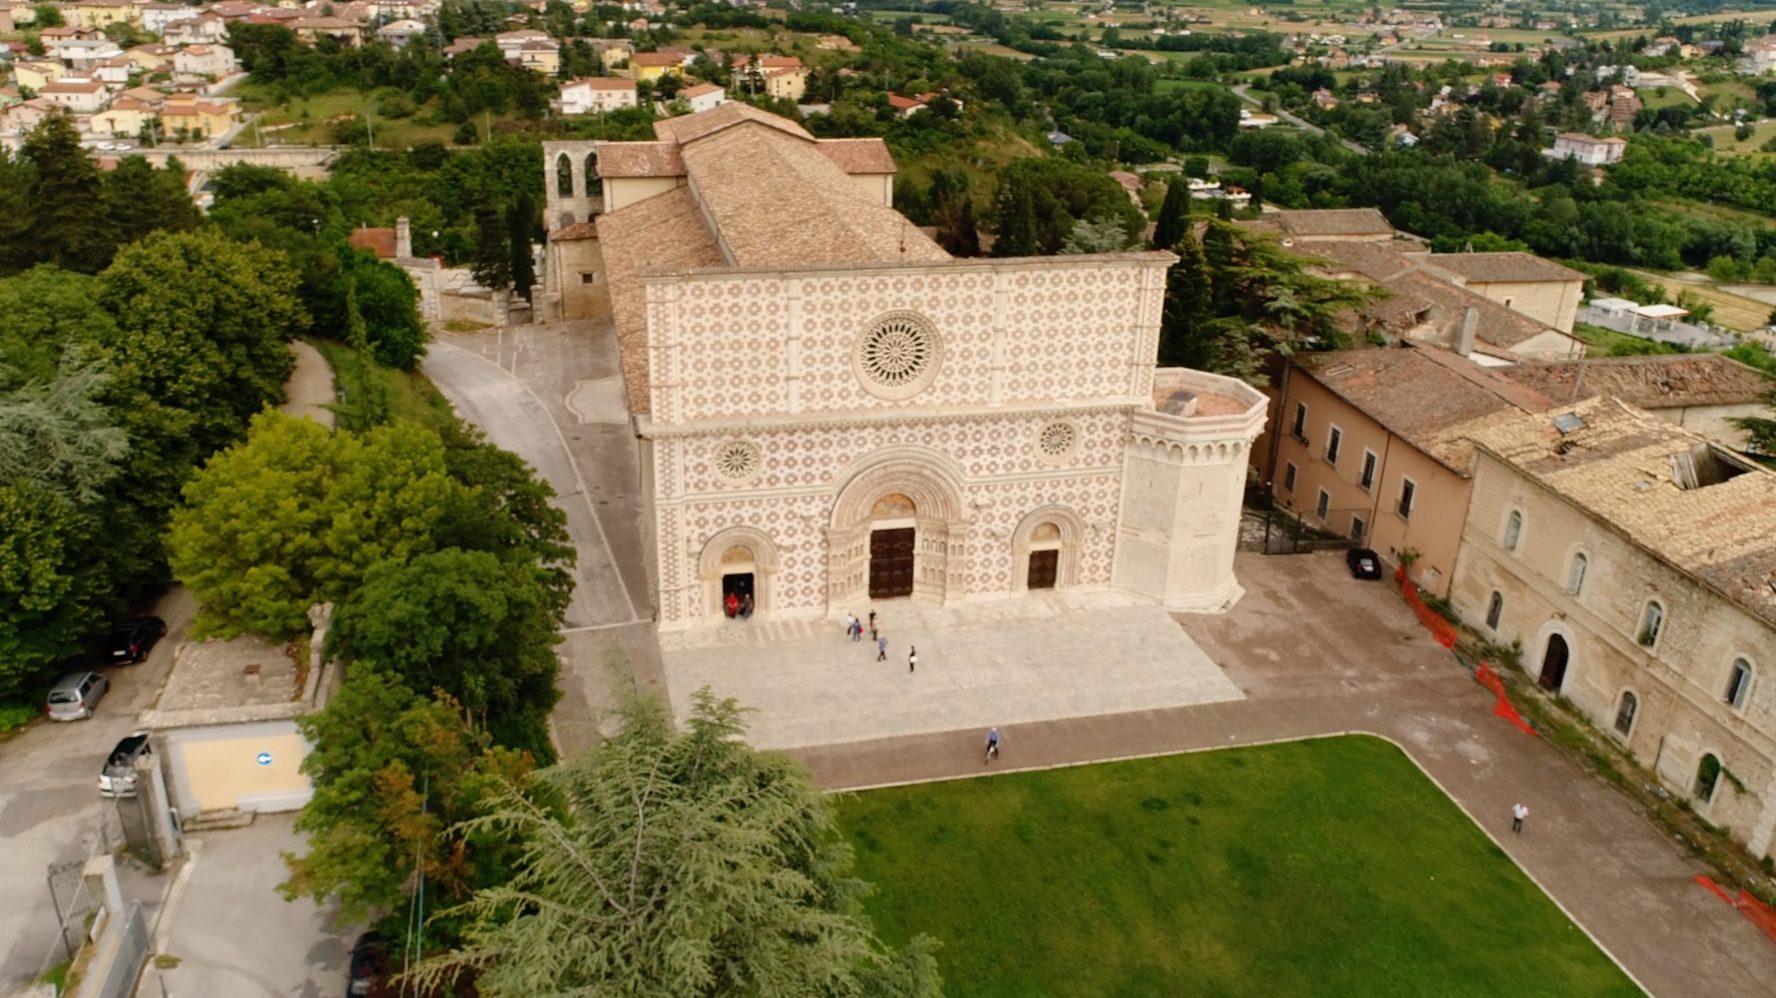 riprese droni roma basilica chiesa l'aquila